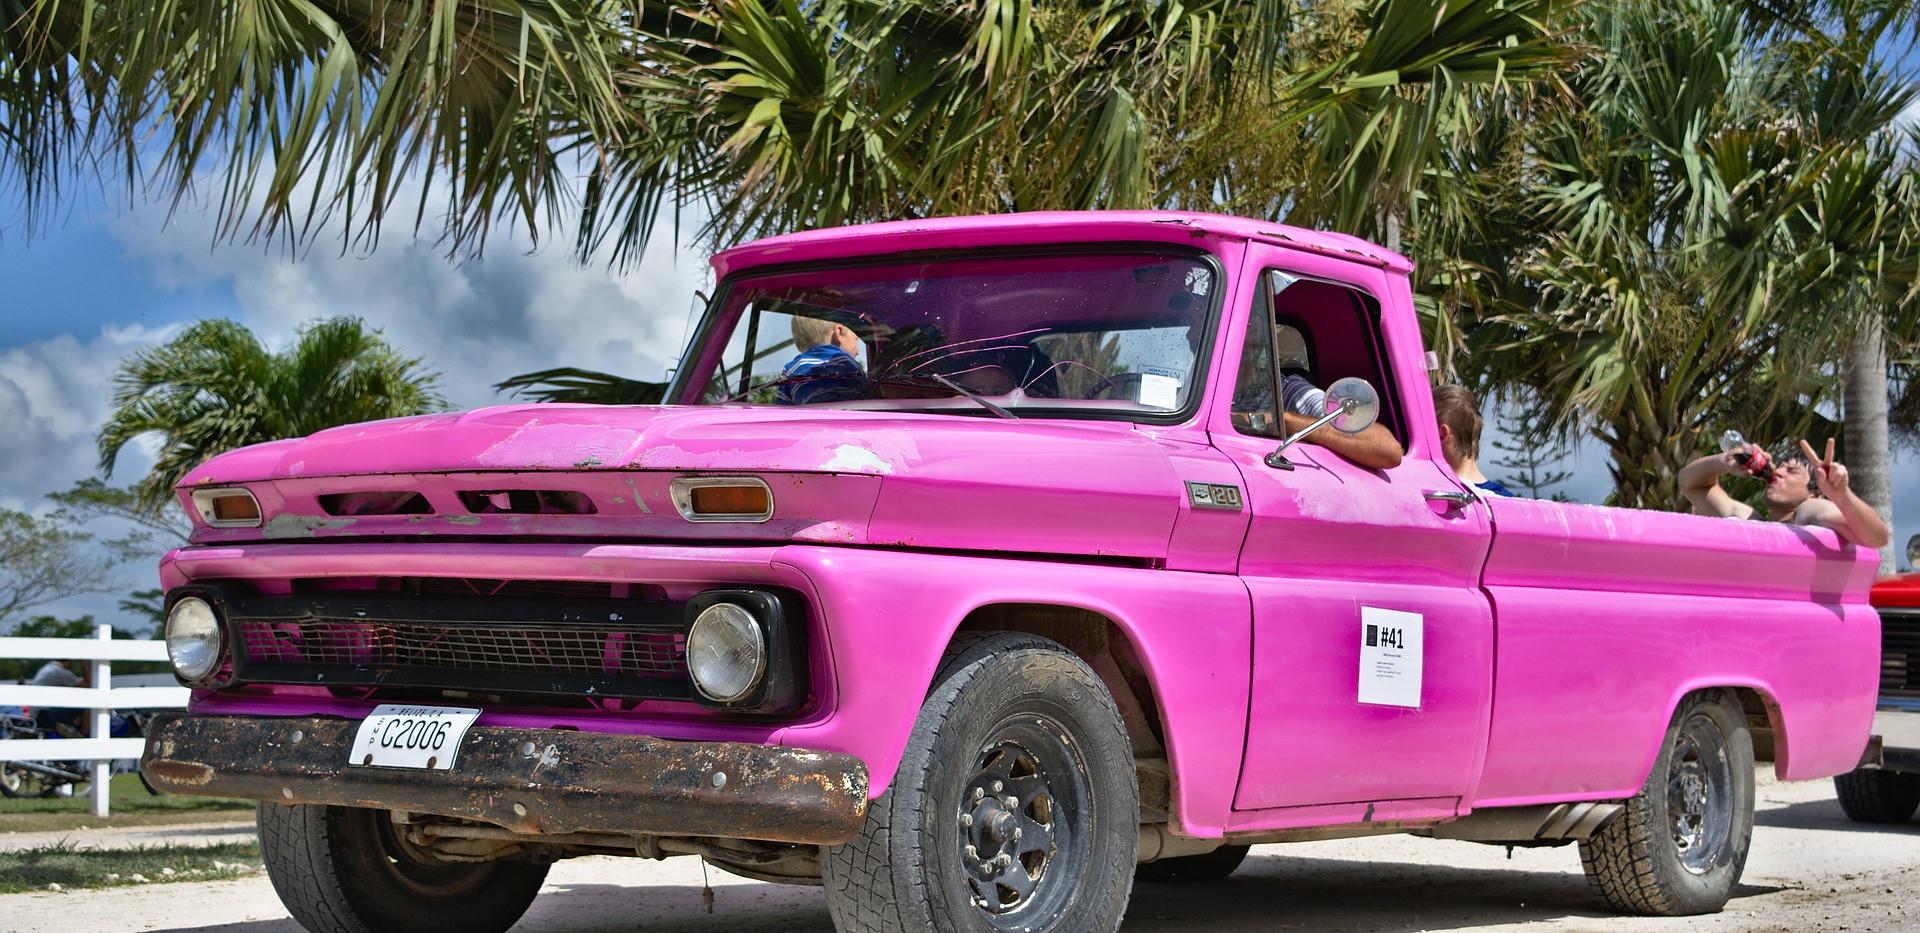 Belize_Quetzal Motivo_3